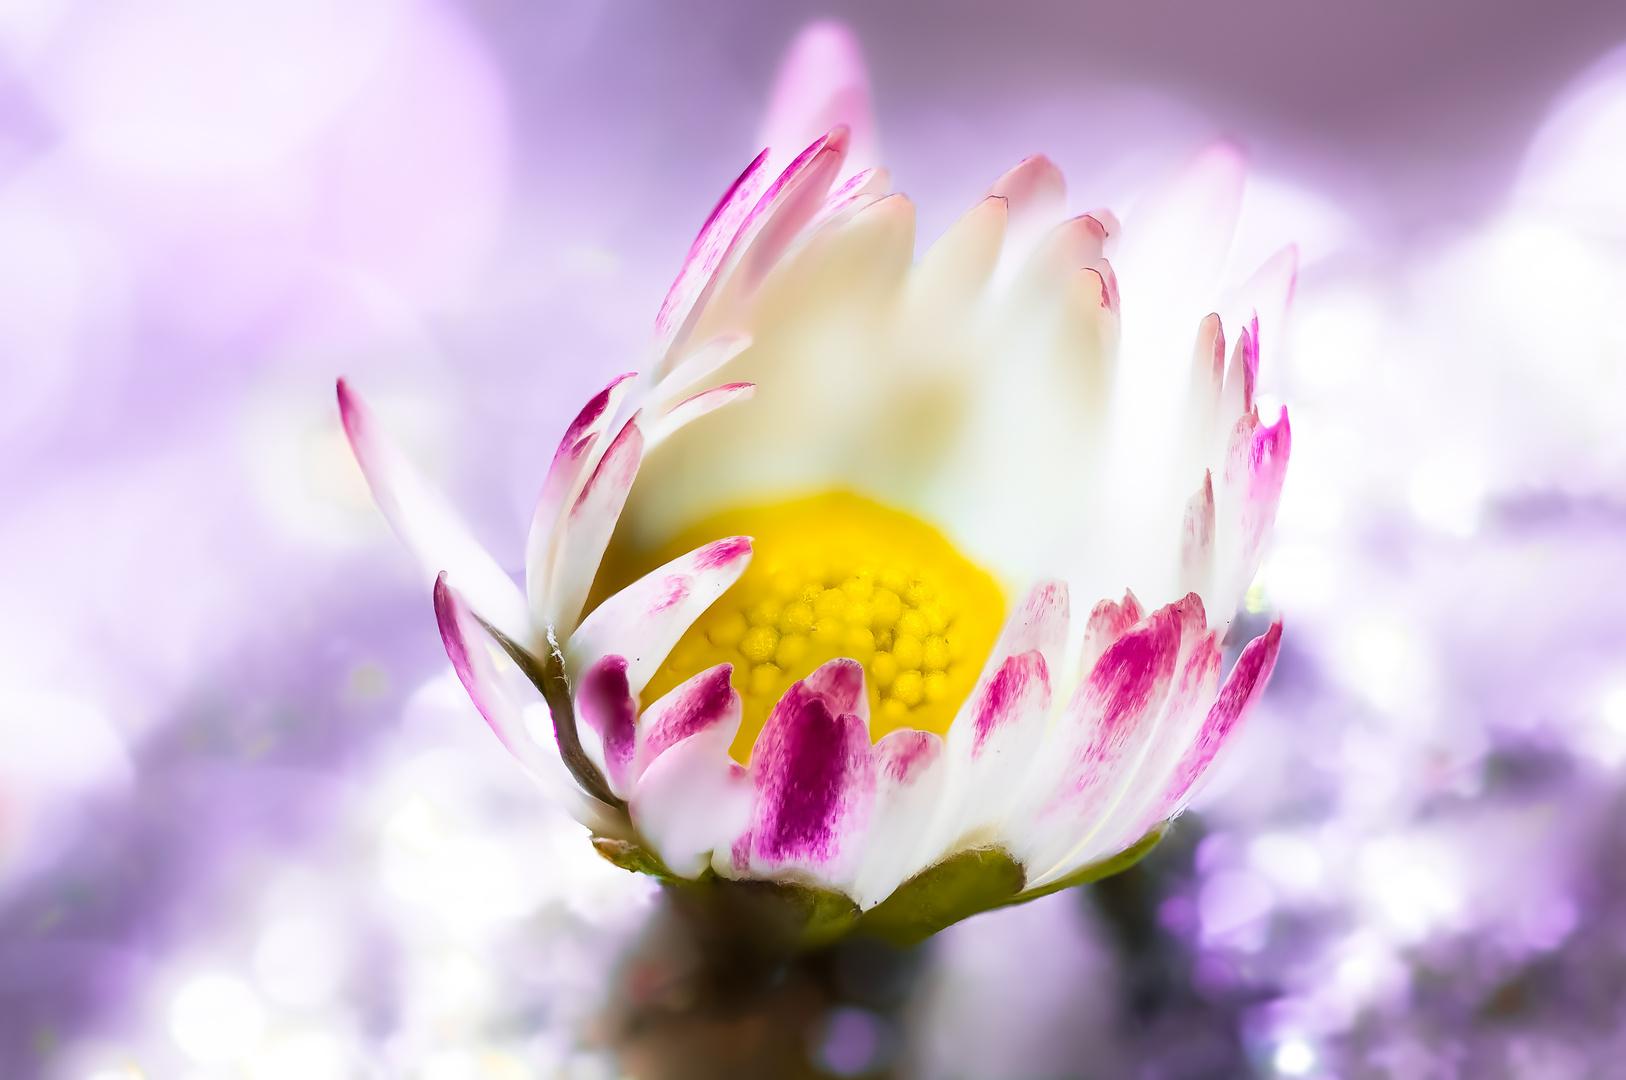 Drops Flowers Gocce Fiori Riflessi Mario jr Nicorelli macro fotografia Macro Photography